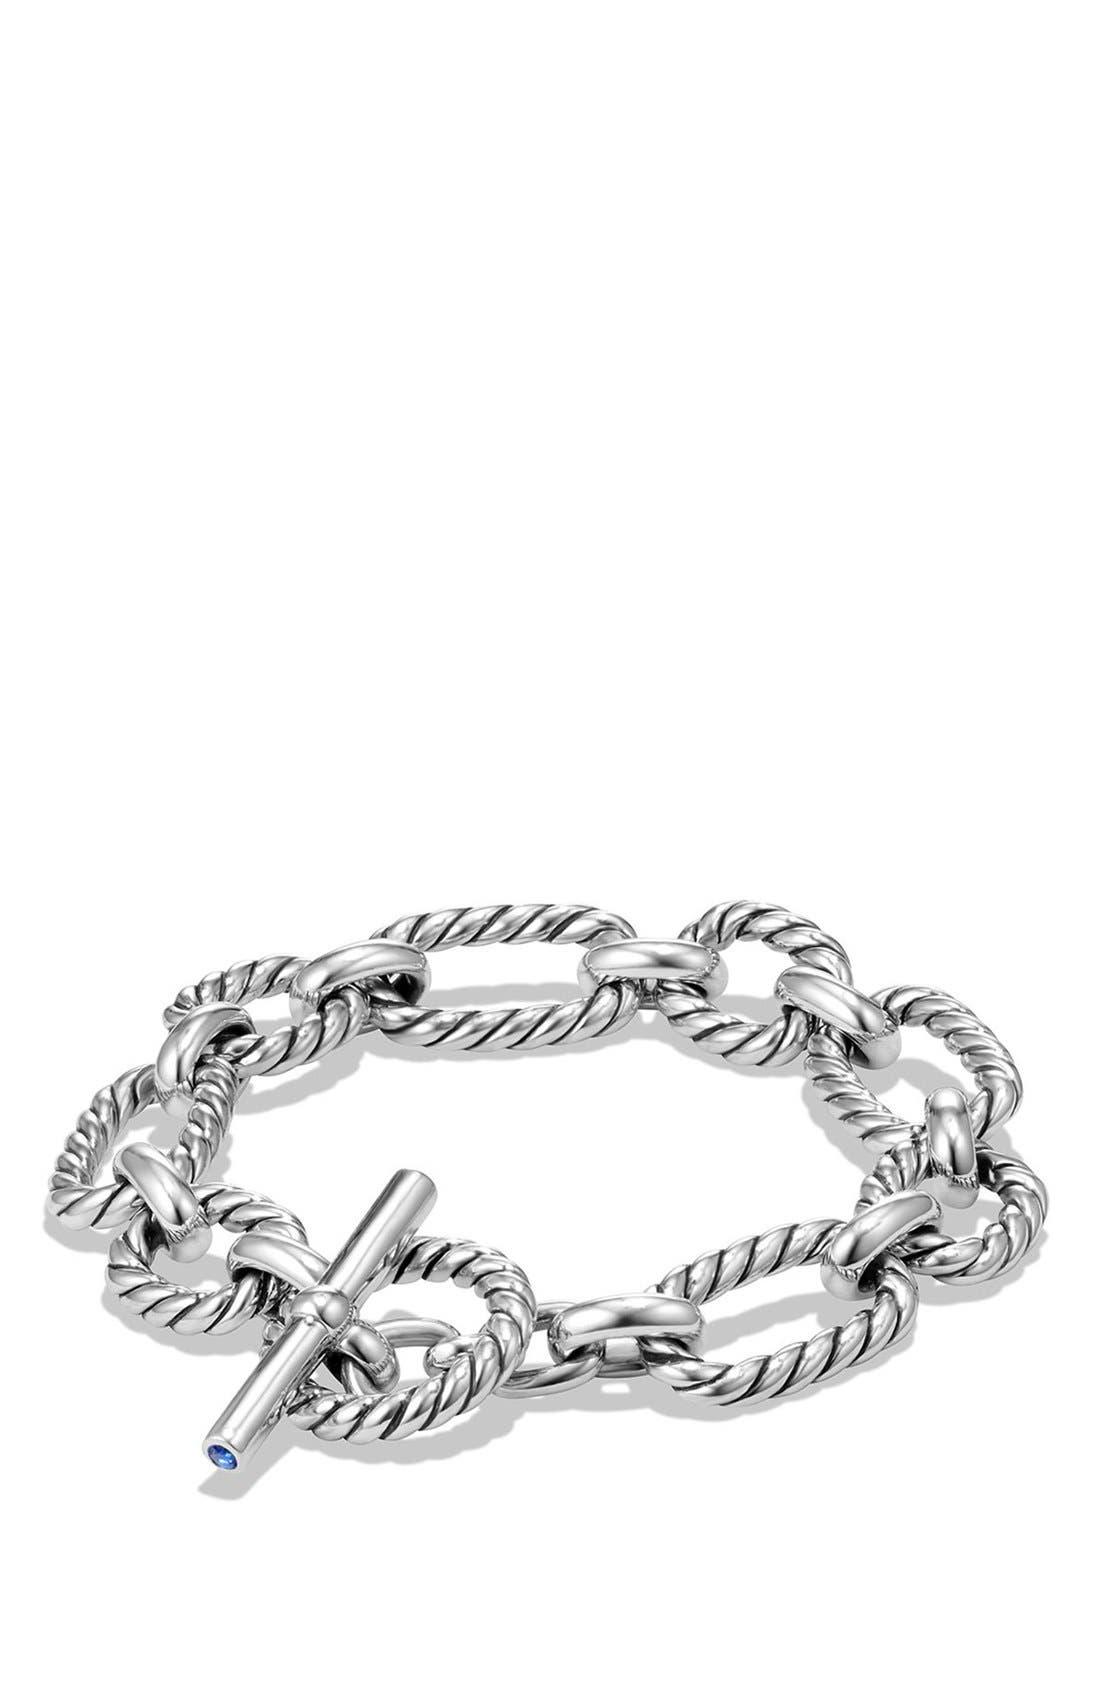 DAVID YURMAN Chain Cushion Link Bracelet with Blue Sapphires